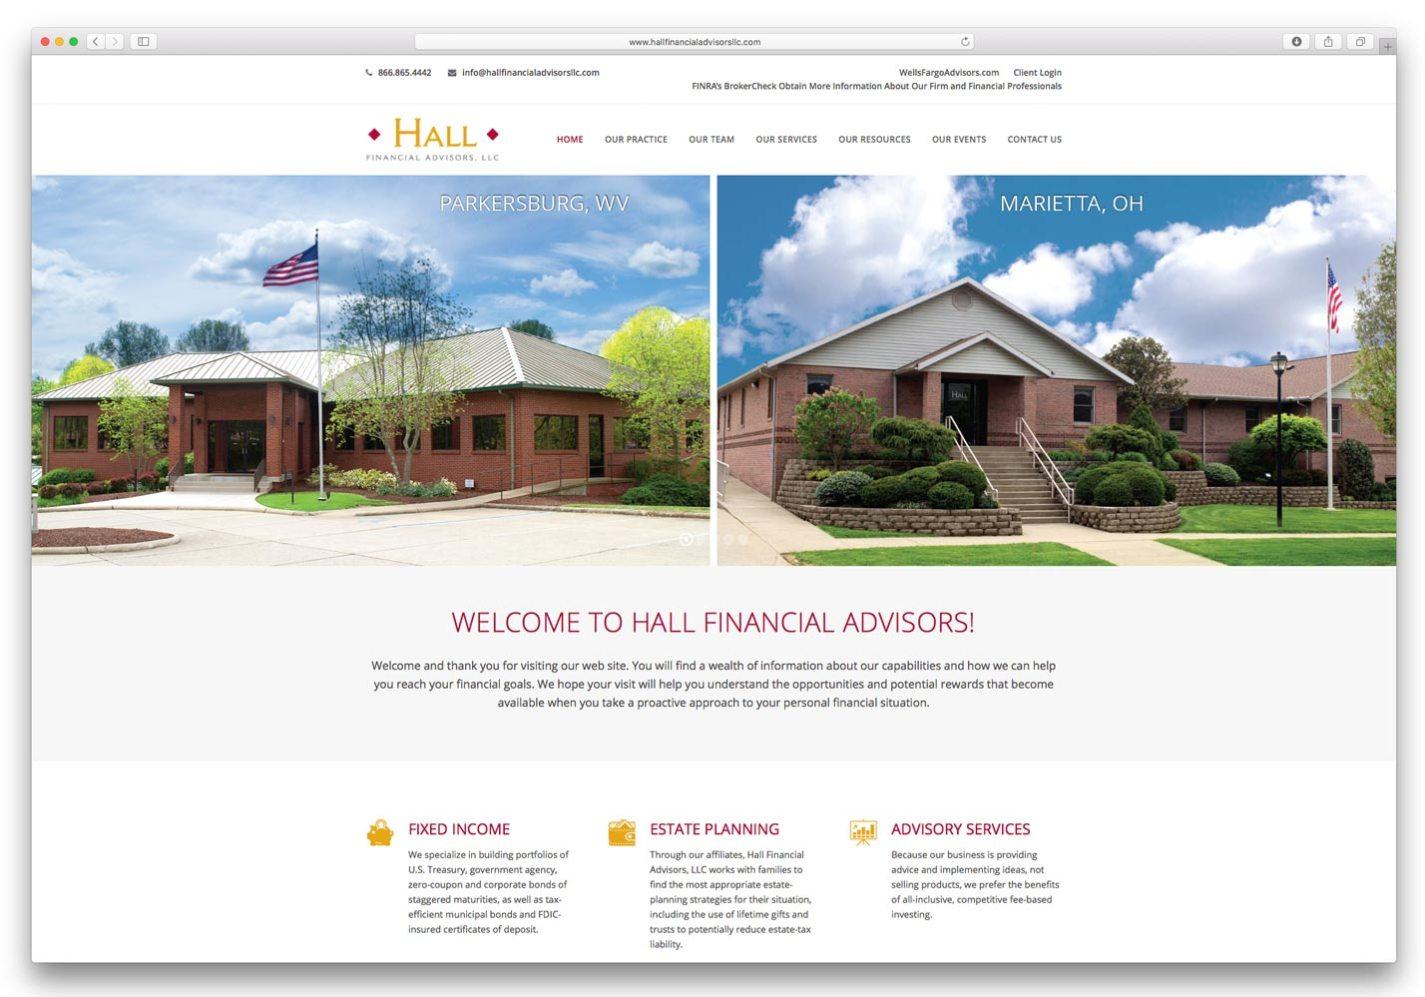 Hall Financial Advisors Website